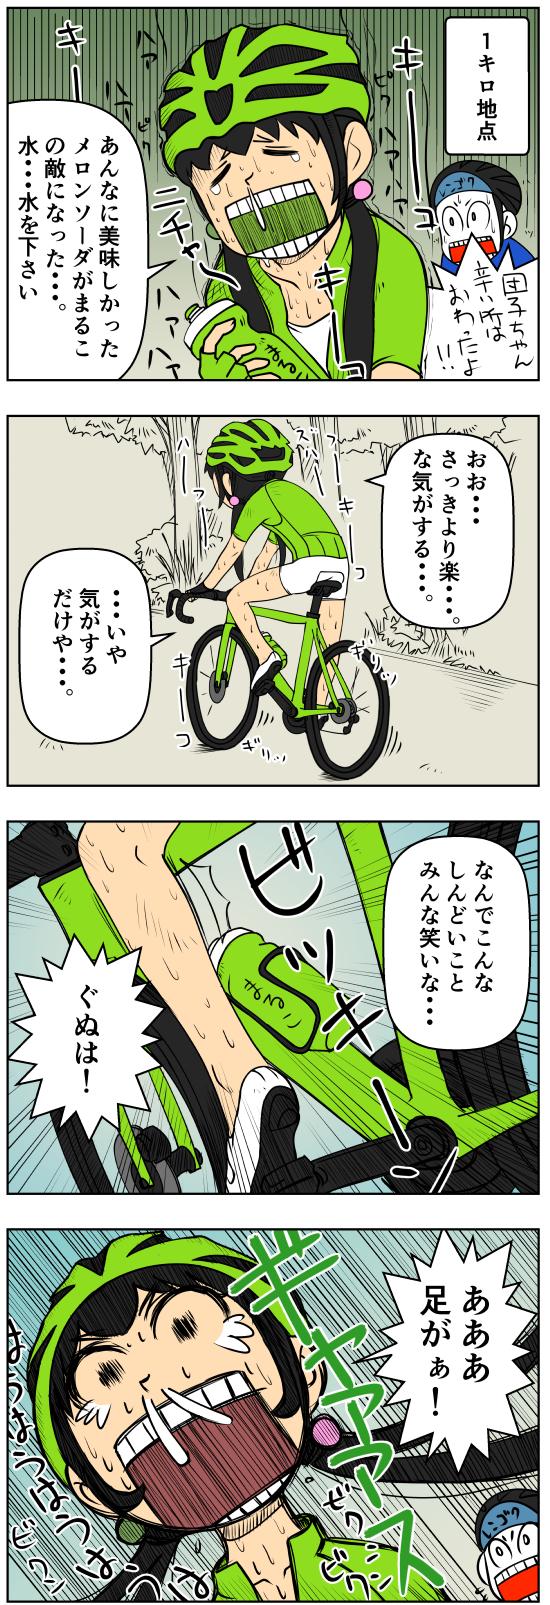 sansyokudanngochan-23-45.jpg